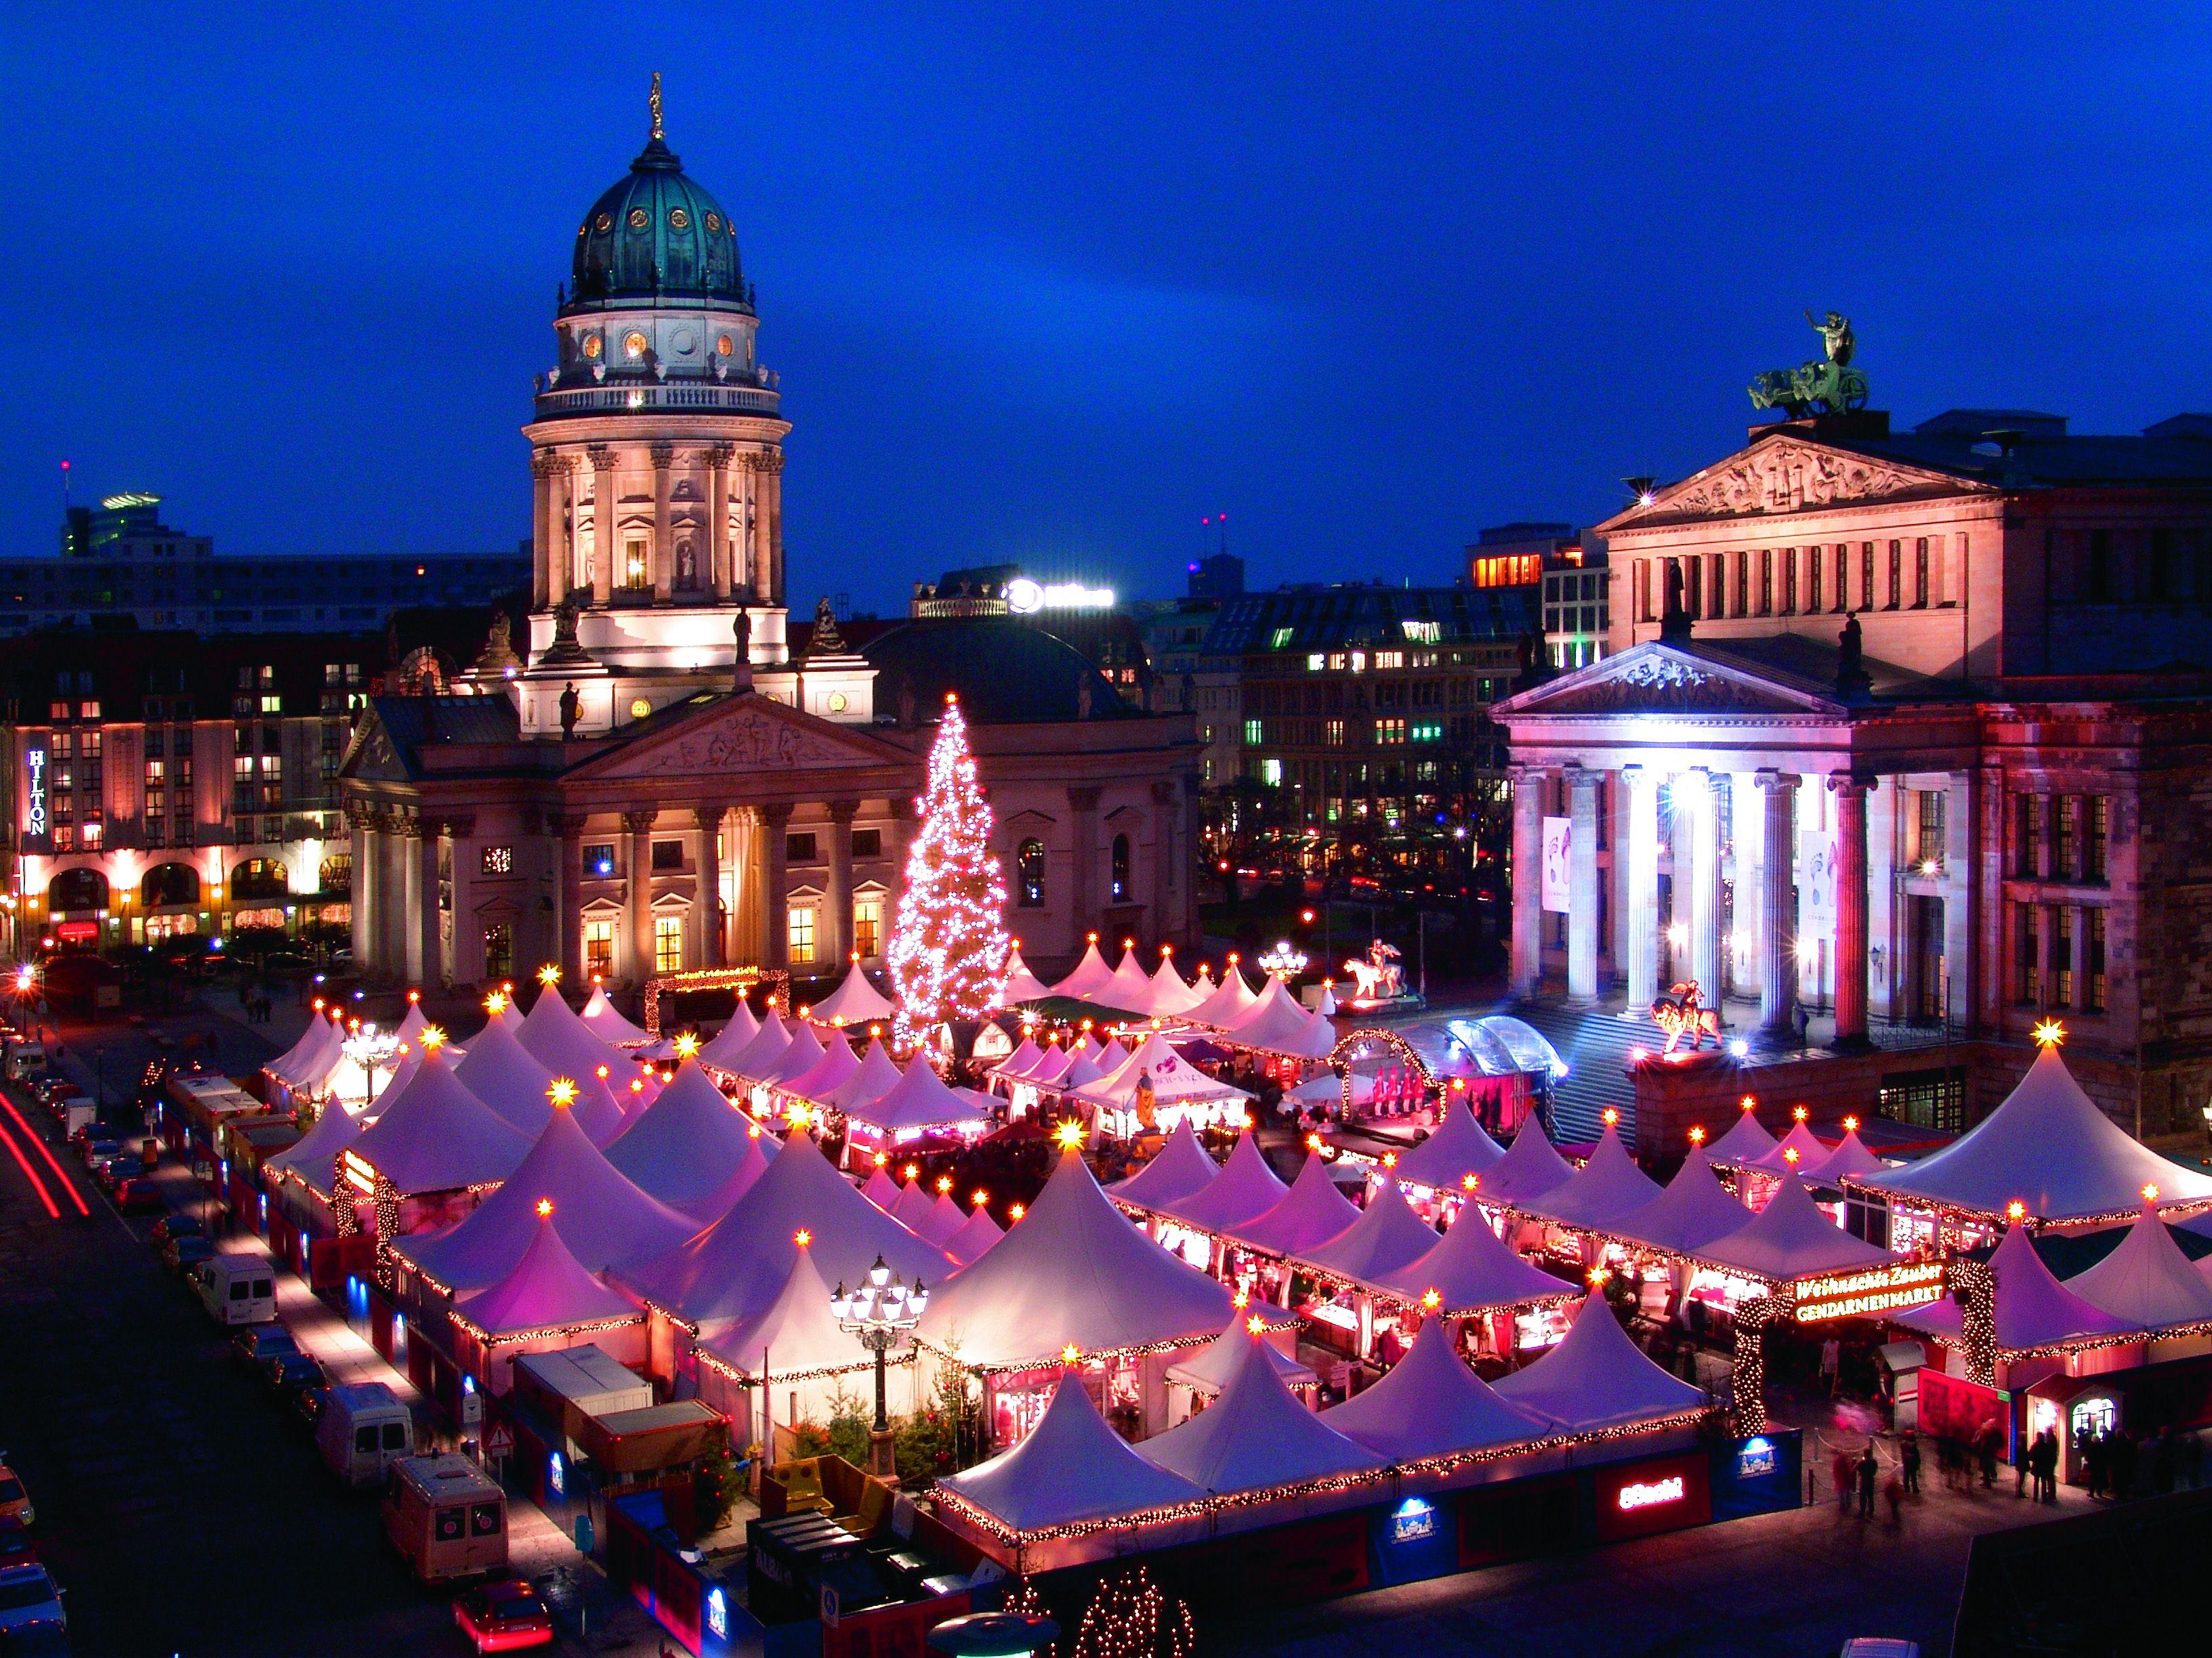 Germany capital Berlin A capital Christmas in Germany's